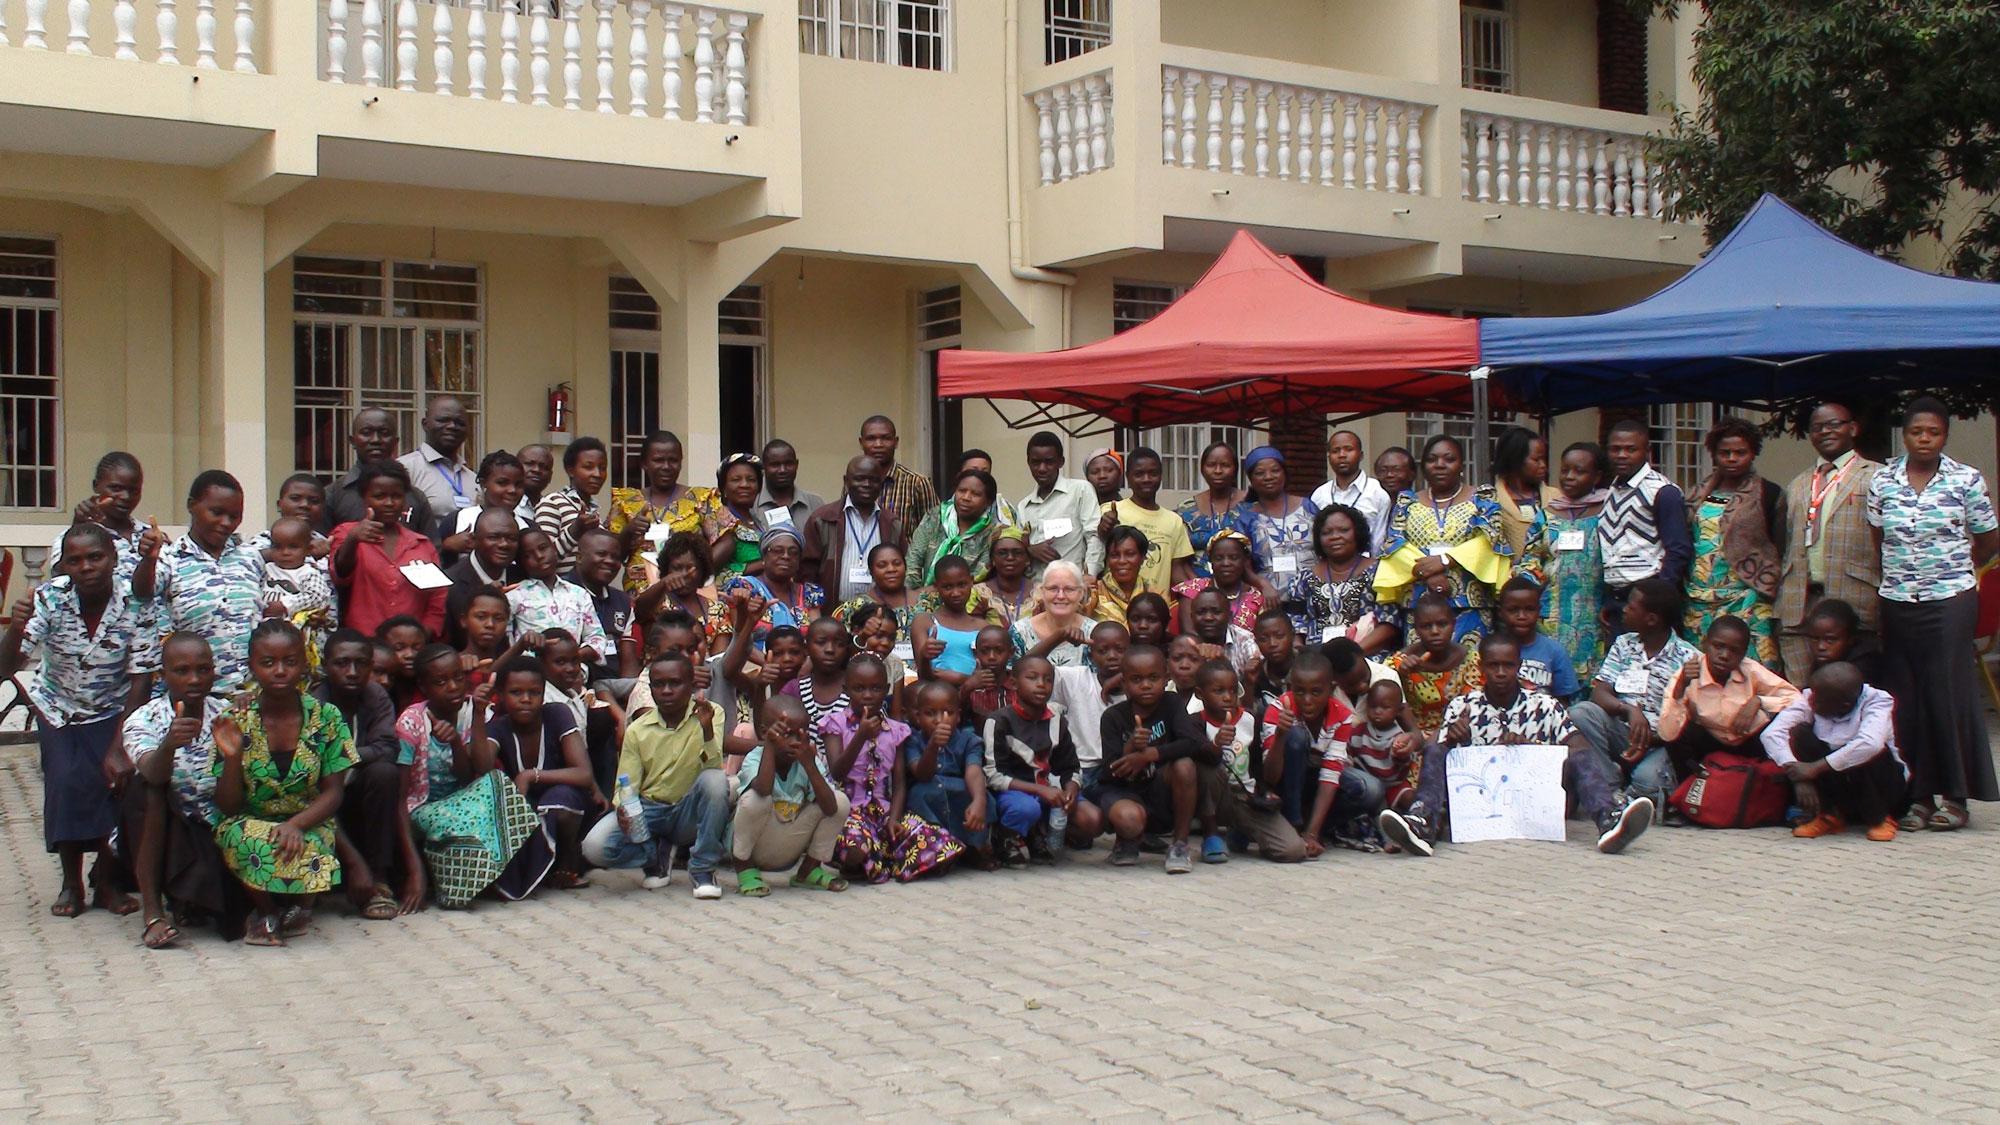 All children, trainee Facilitators, and Master Facilitators